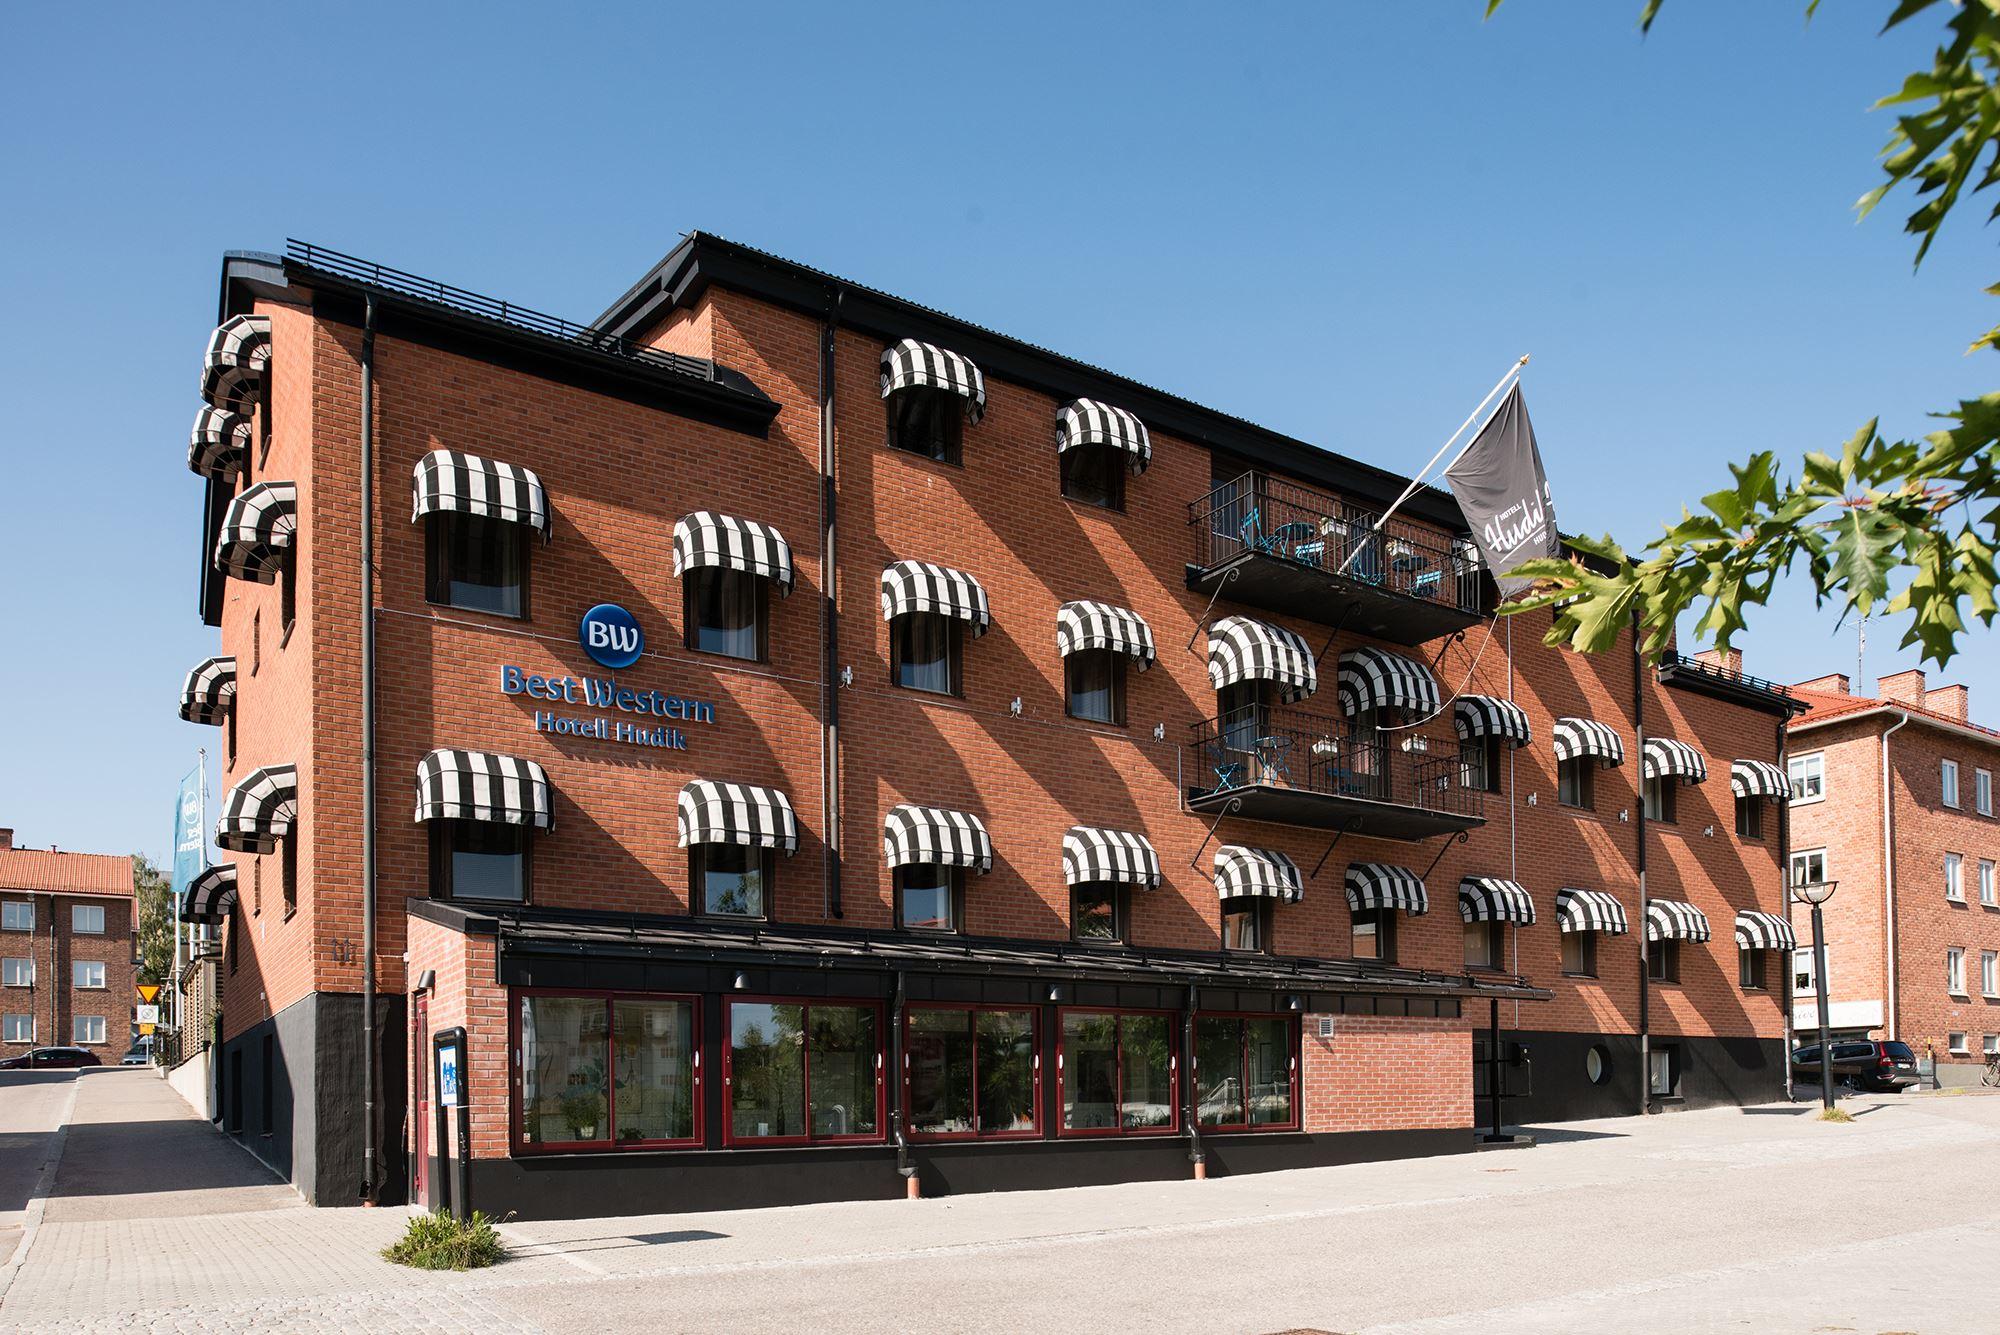 Best Western Hotell Hudik